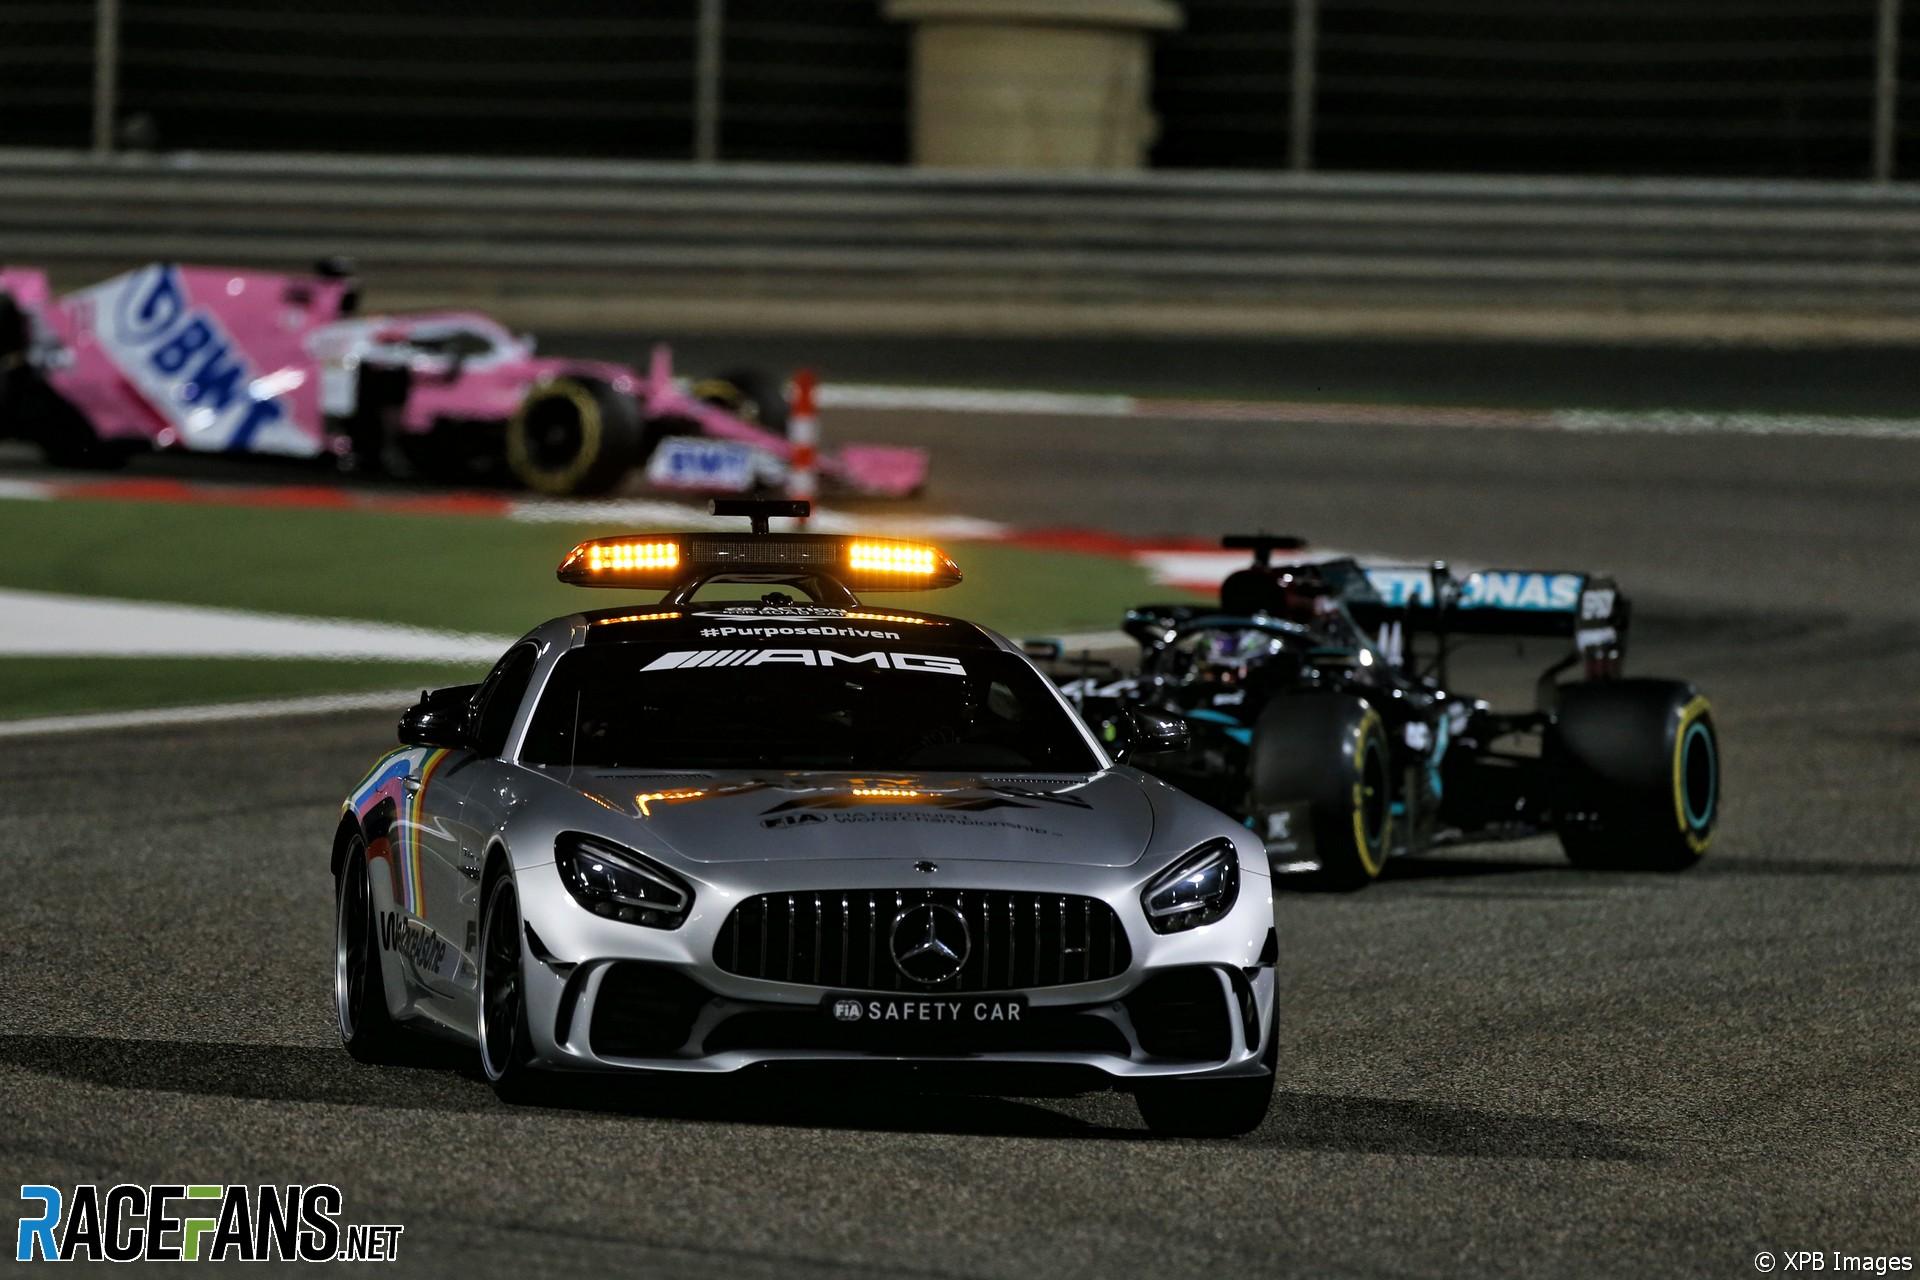 Safety Car, Bahrain International Circuit, 2020